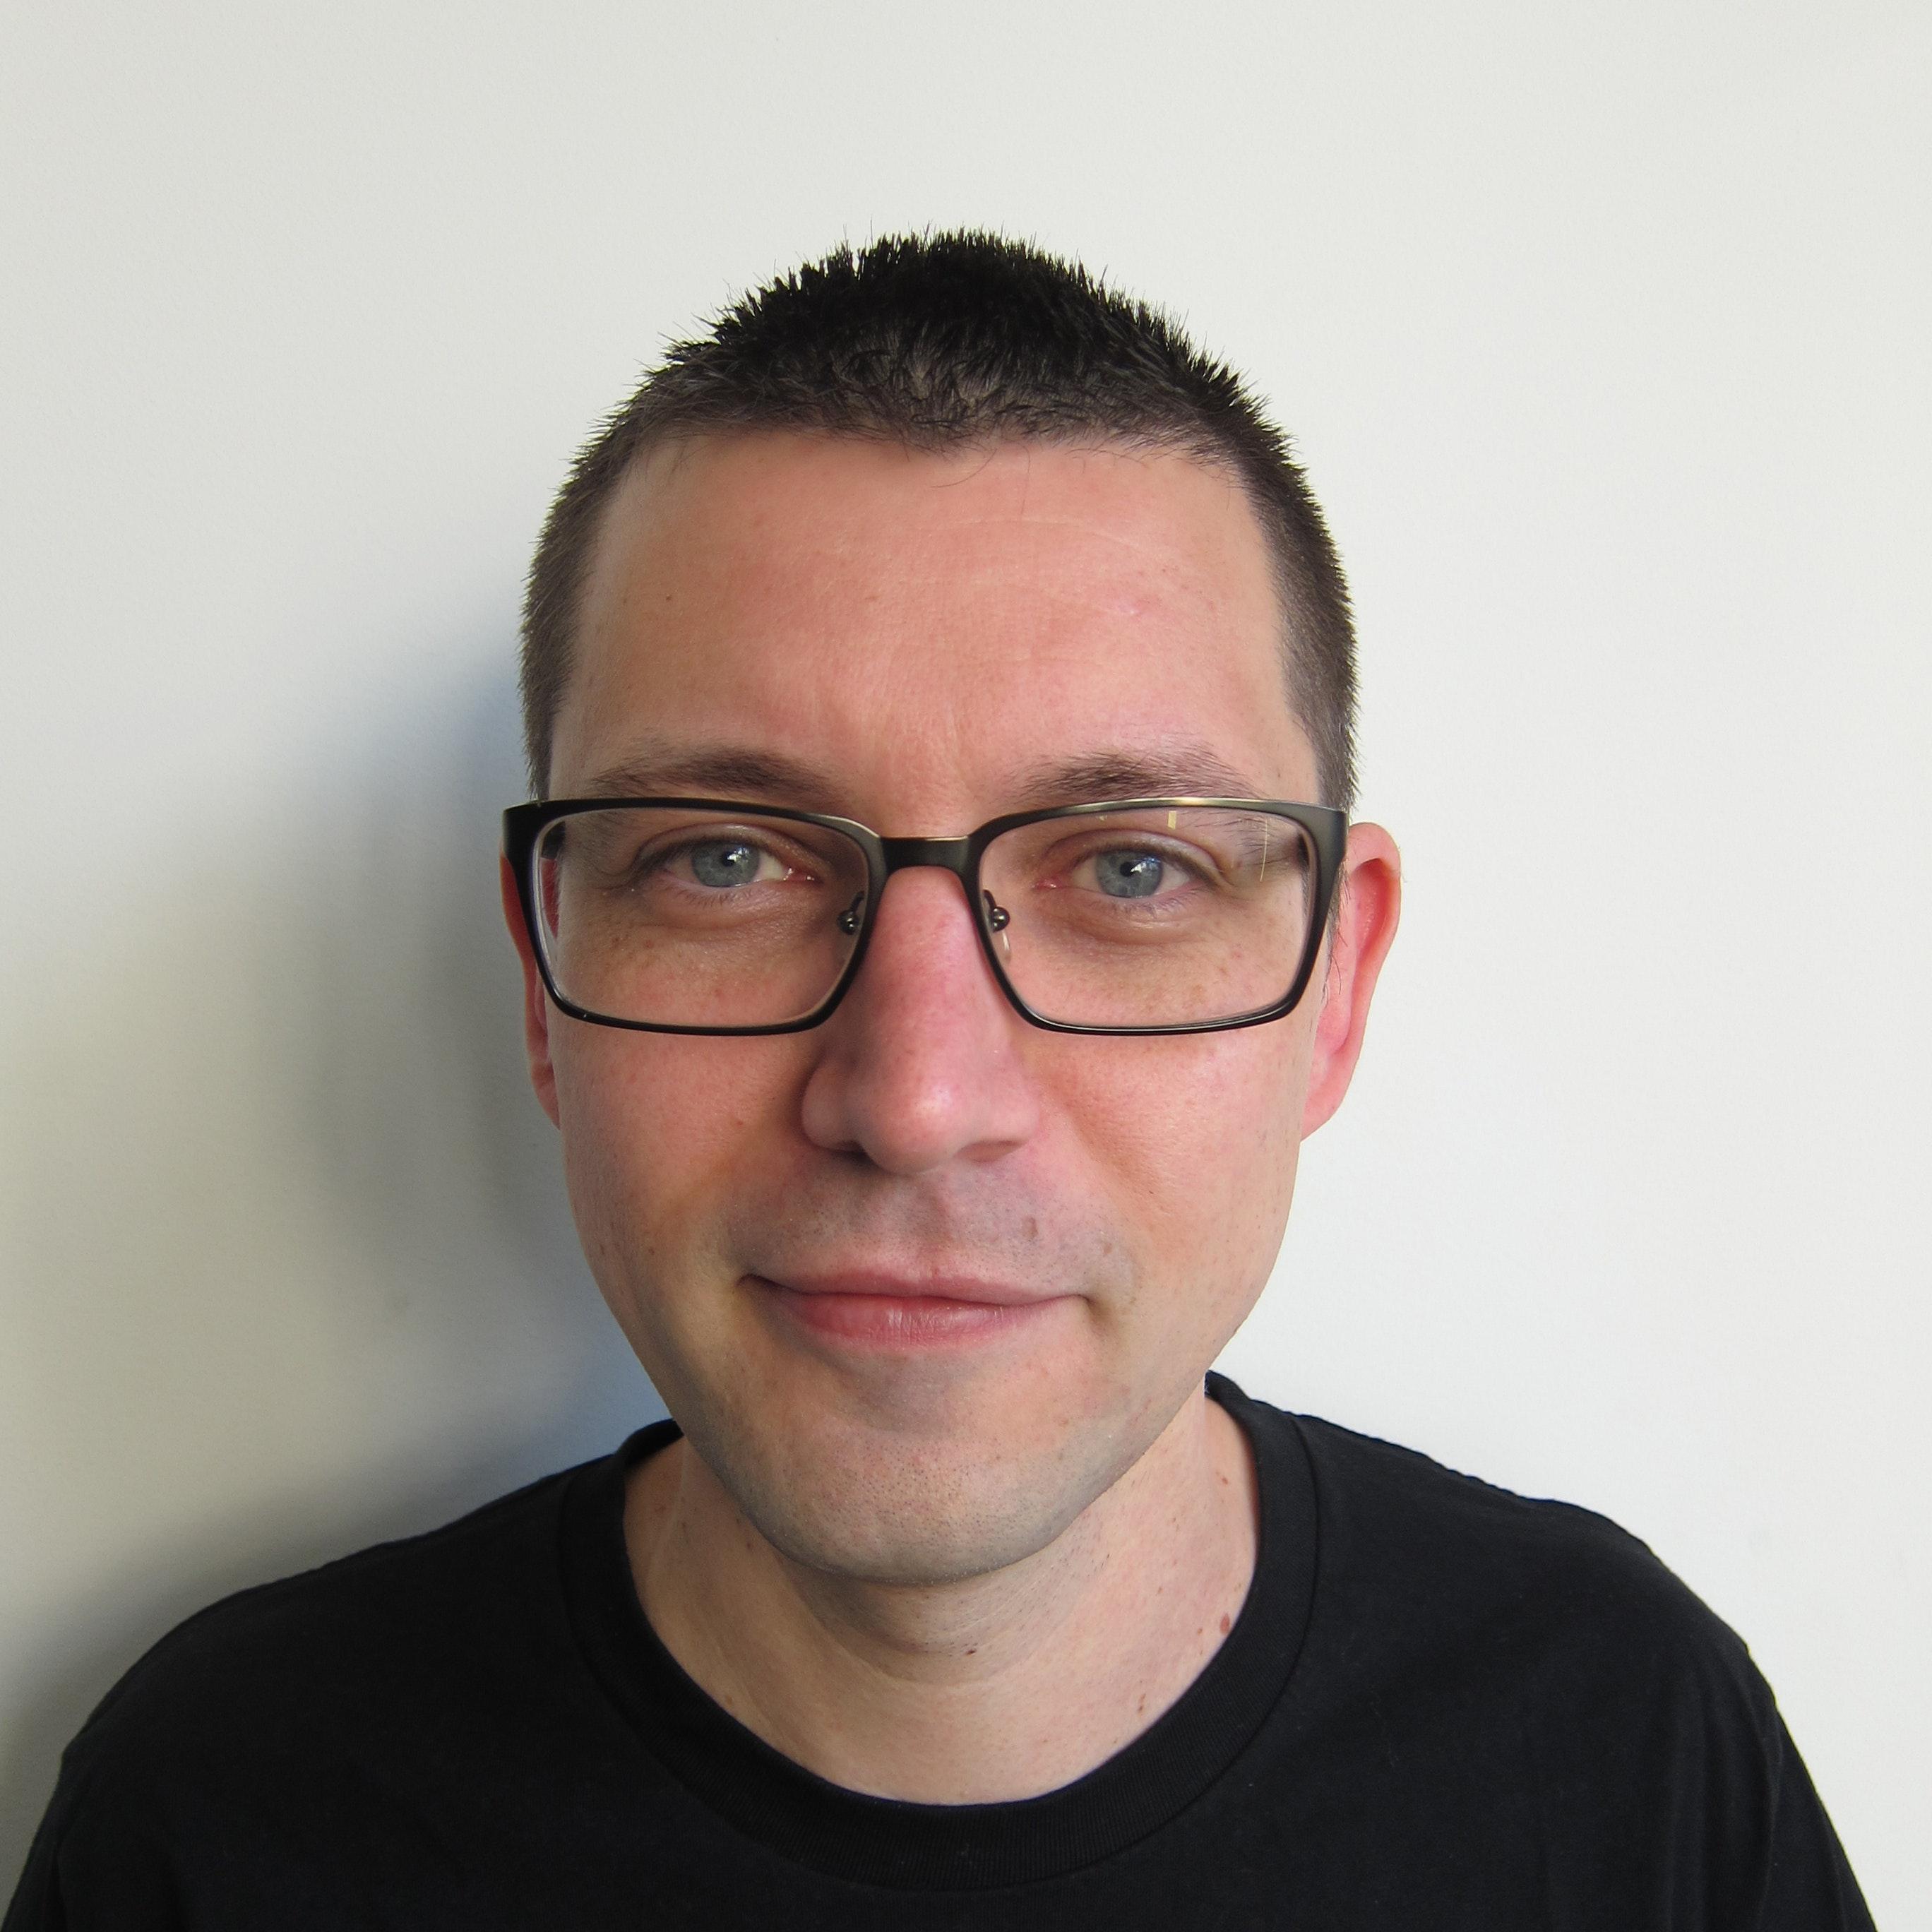 Paul Leitmanis